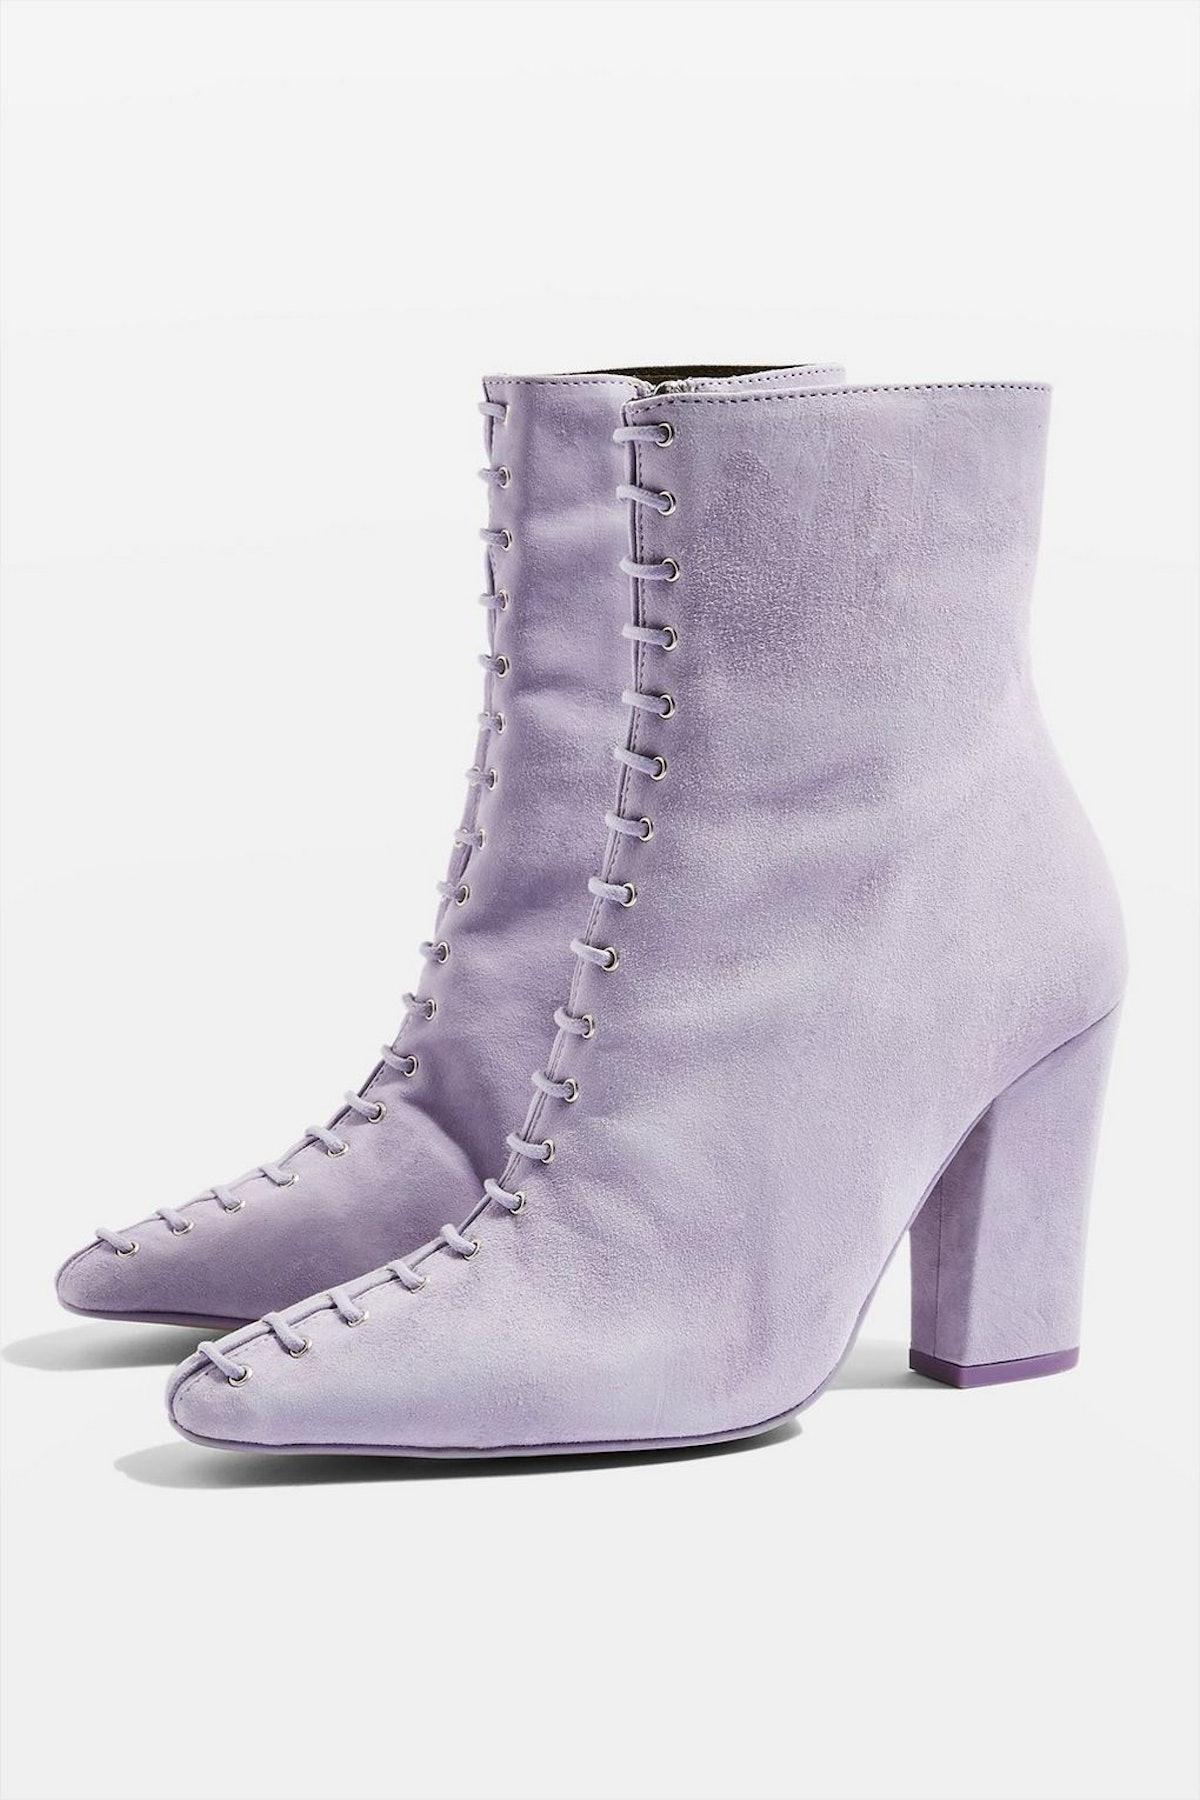 Harriet Lace Boots